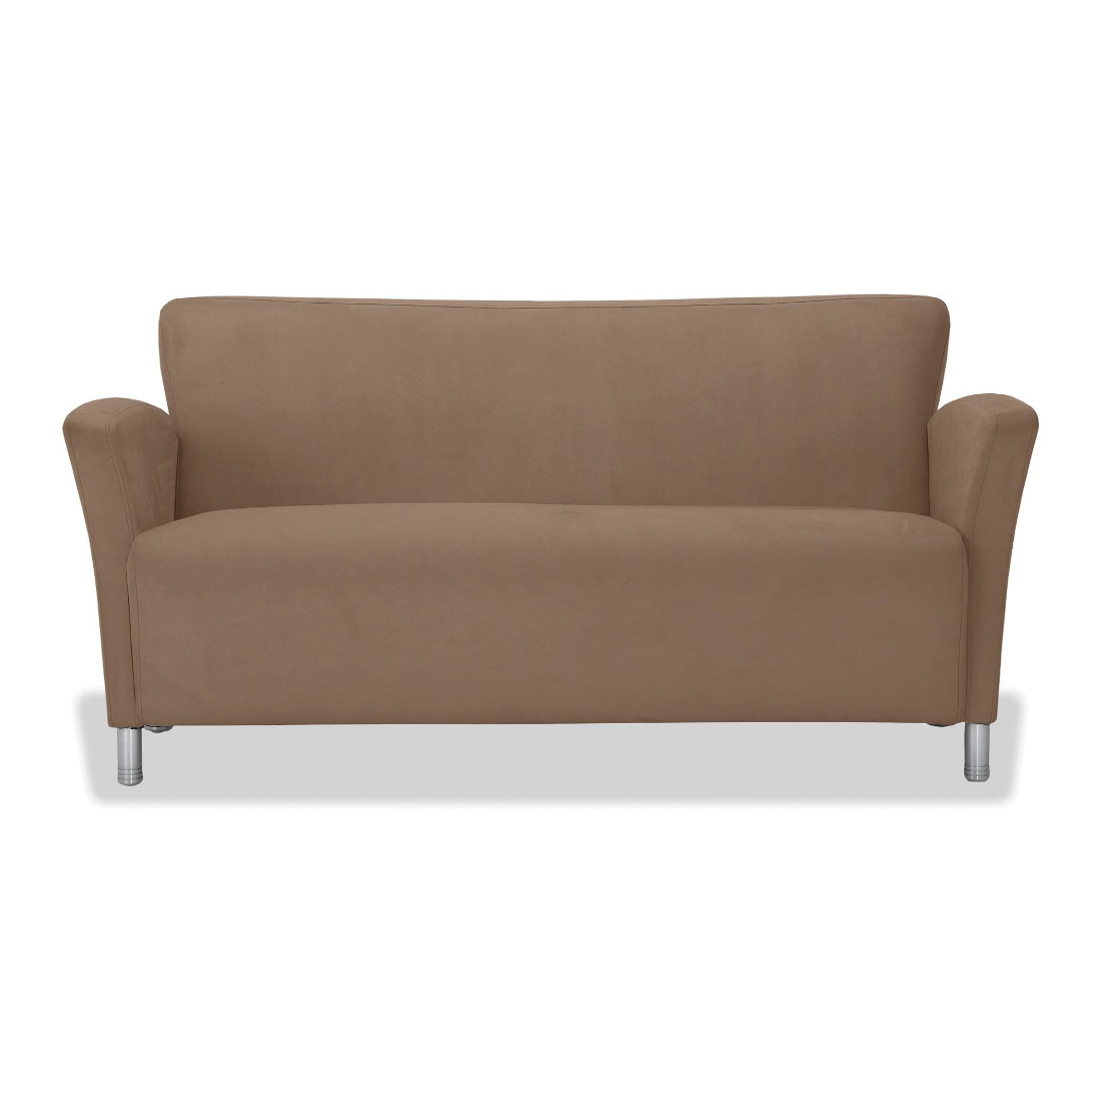 E3152 Sofa